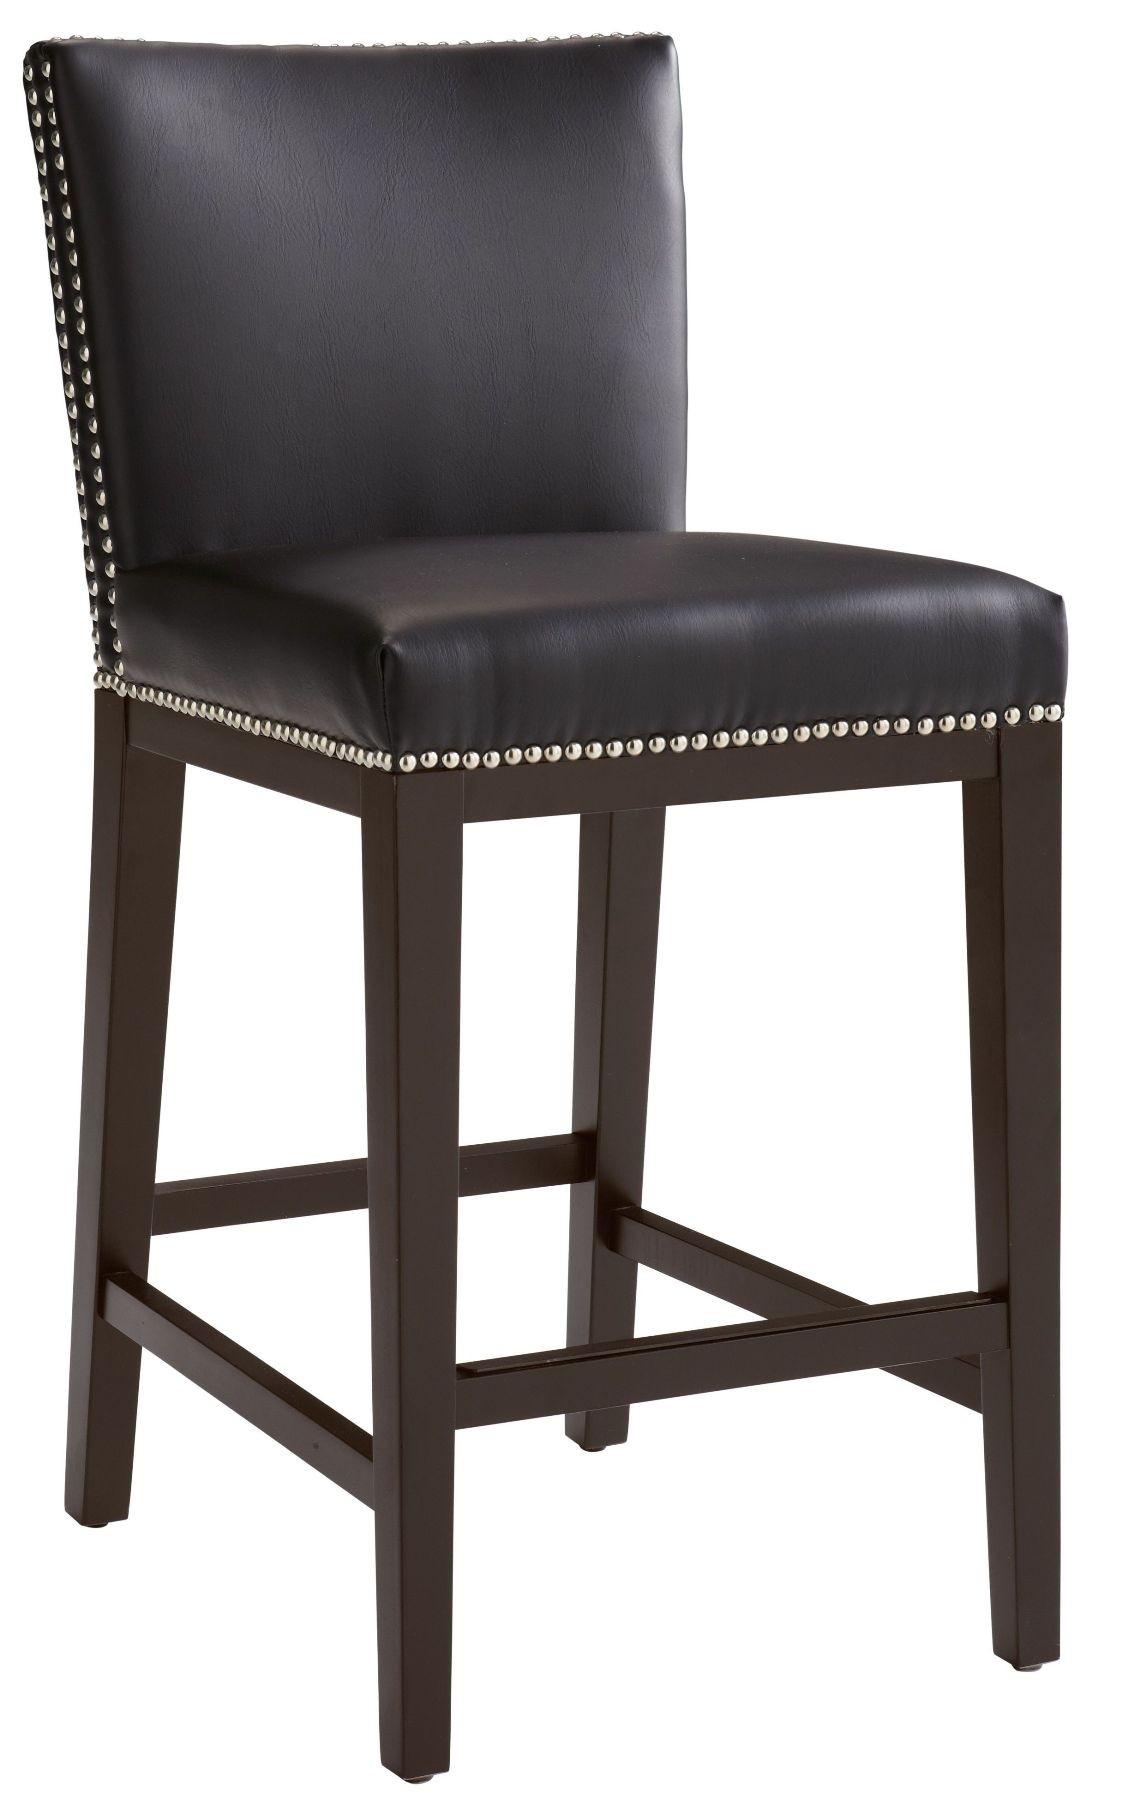 vintage brown leather counter stool from sunpan 65871 coleman furniture. Black Bedroom Furniture Sets. Home Design Ideas